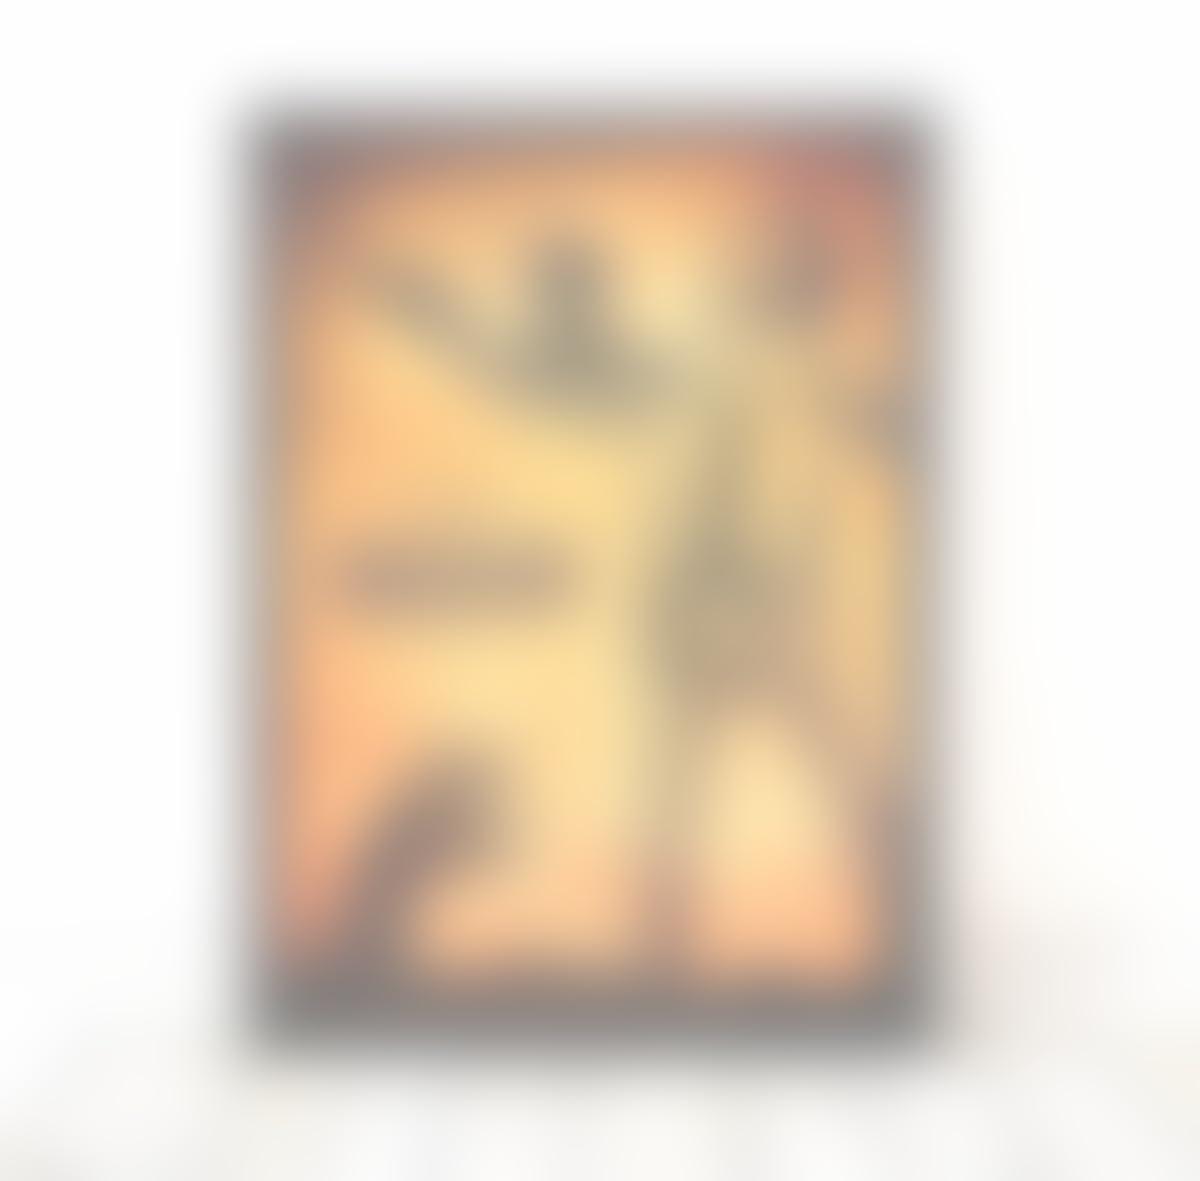 Amazon.com: BeetleJuice Tim Burton Collection Minimalist Movie ...